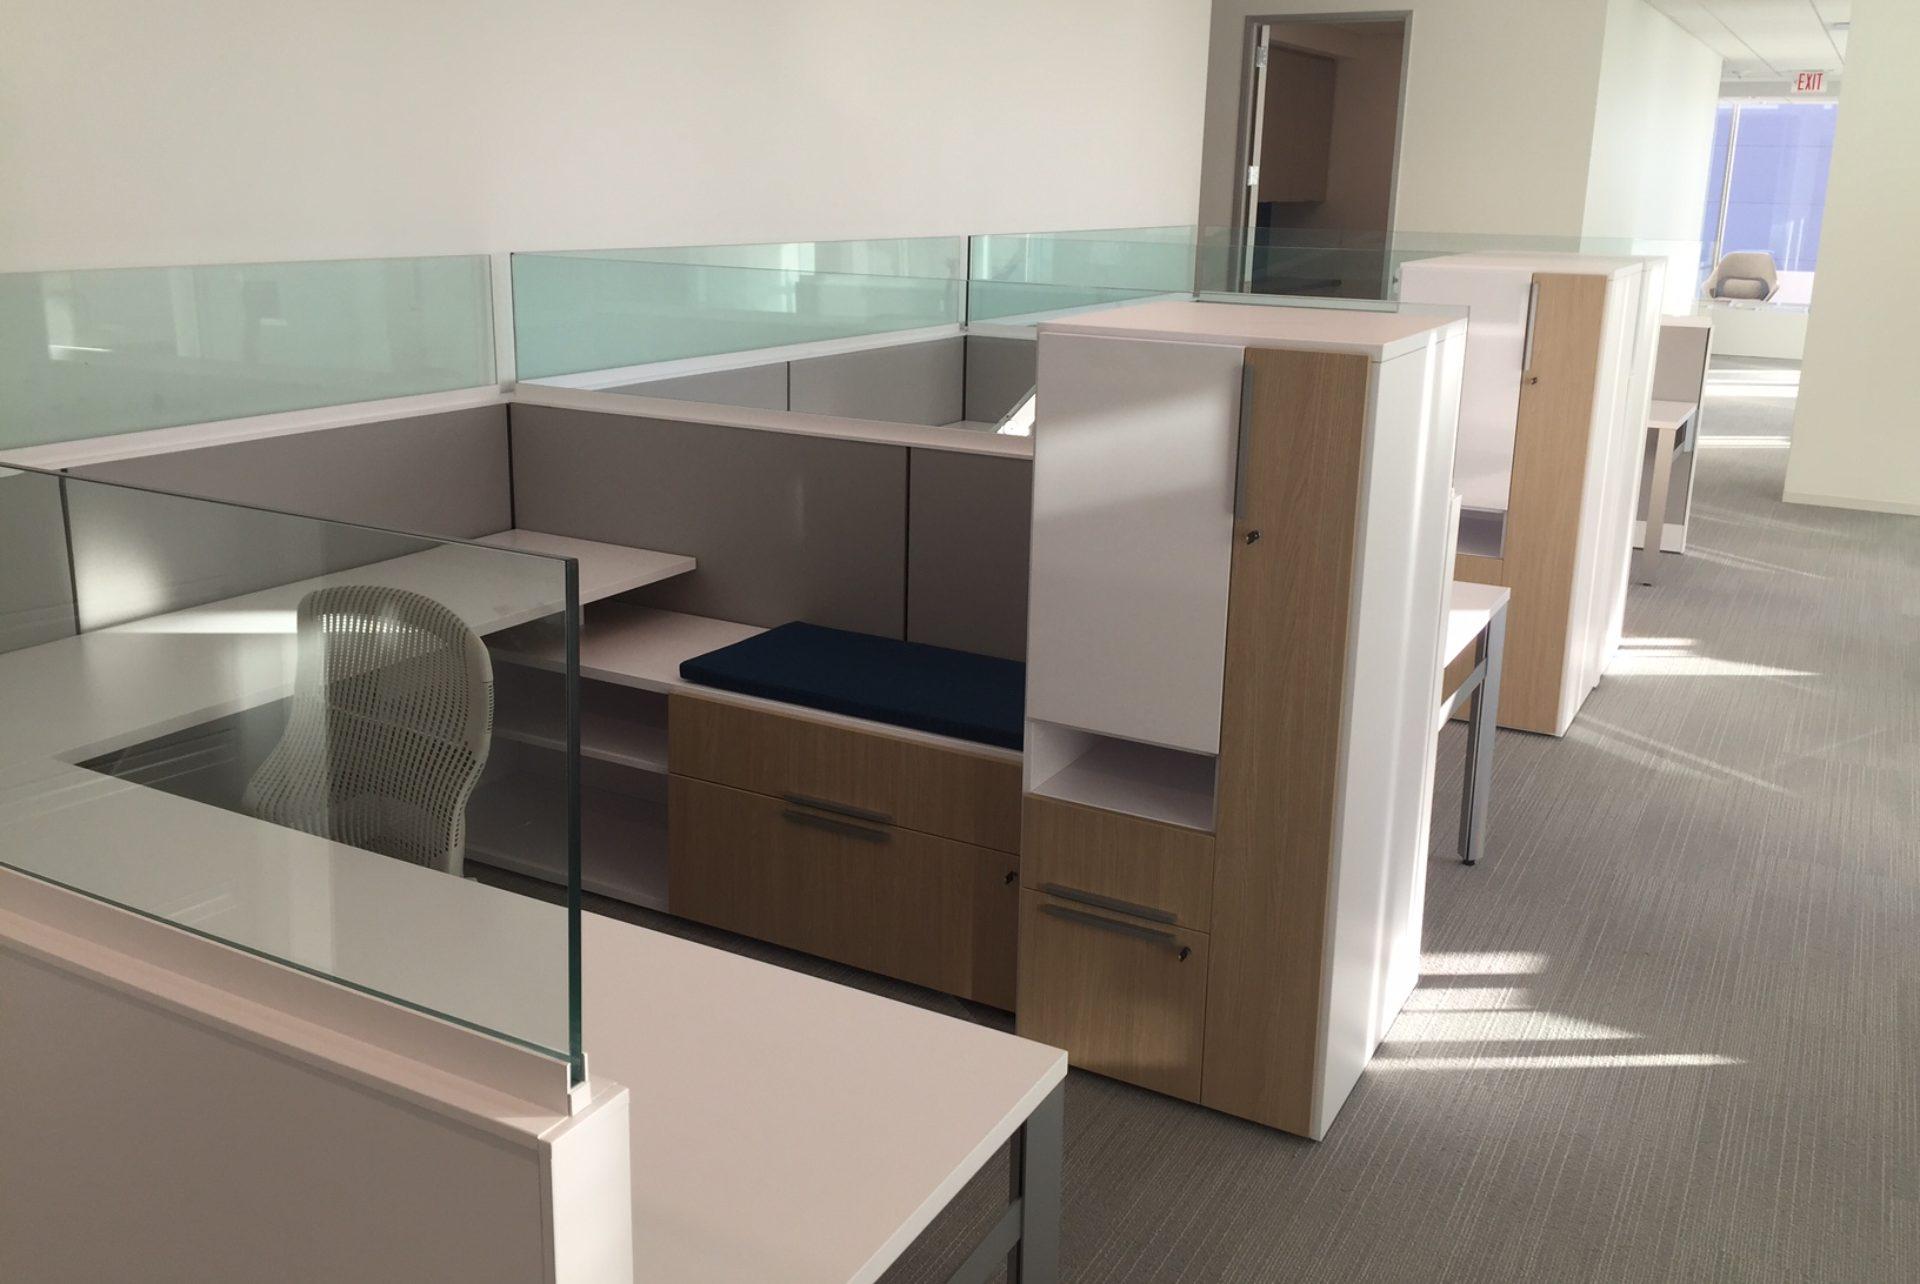 Turn Key Office Installations, LLC